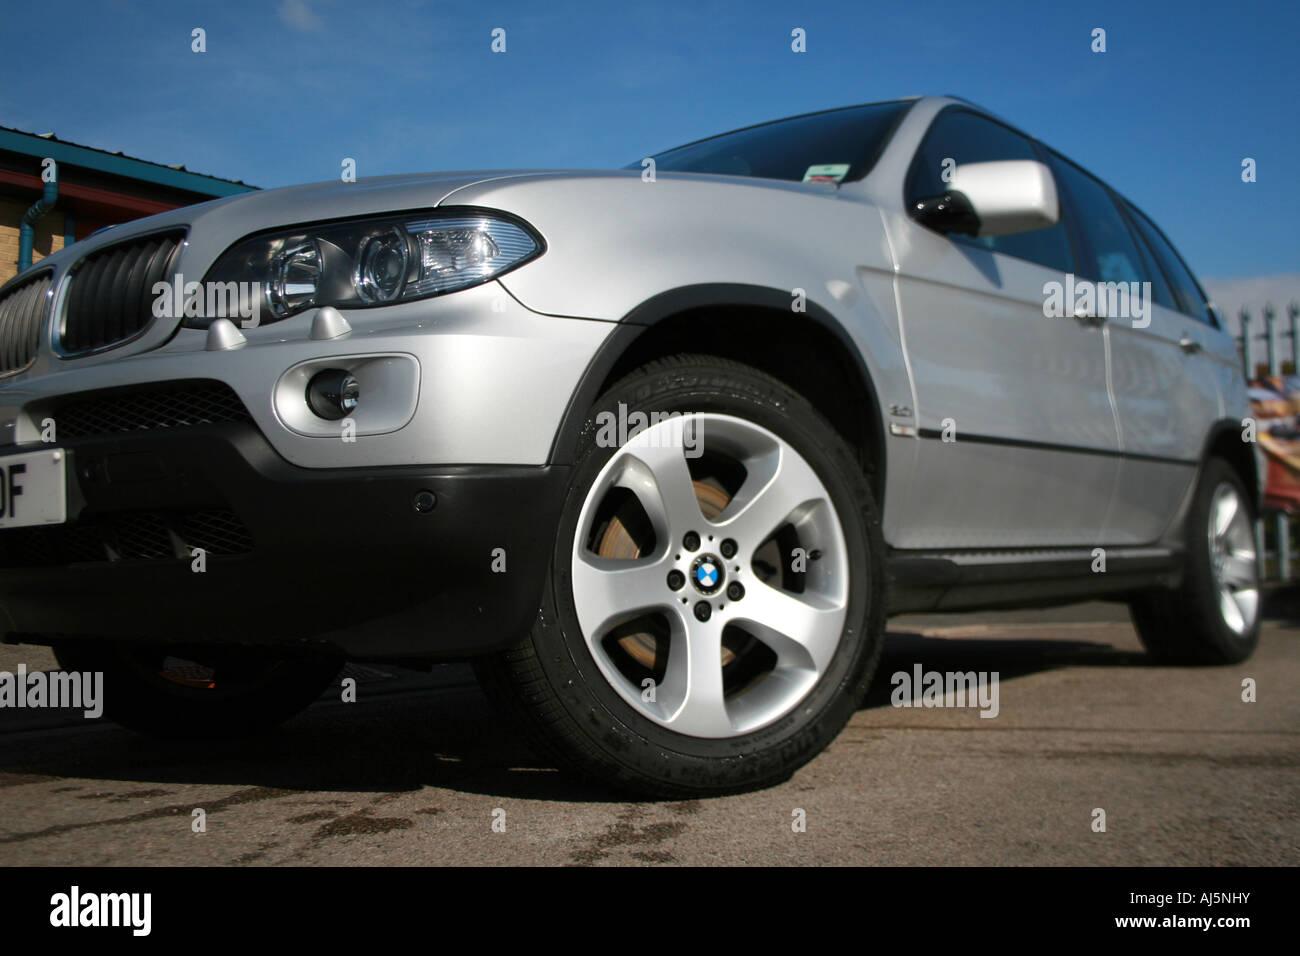 BMW X5 - Stock Image